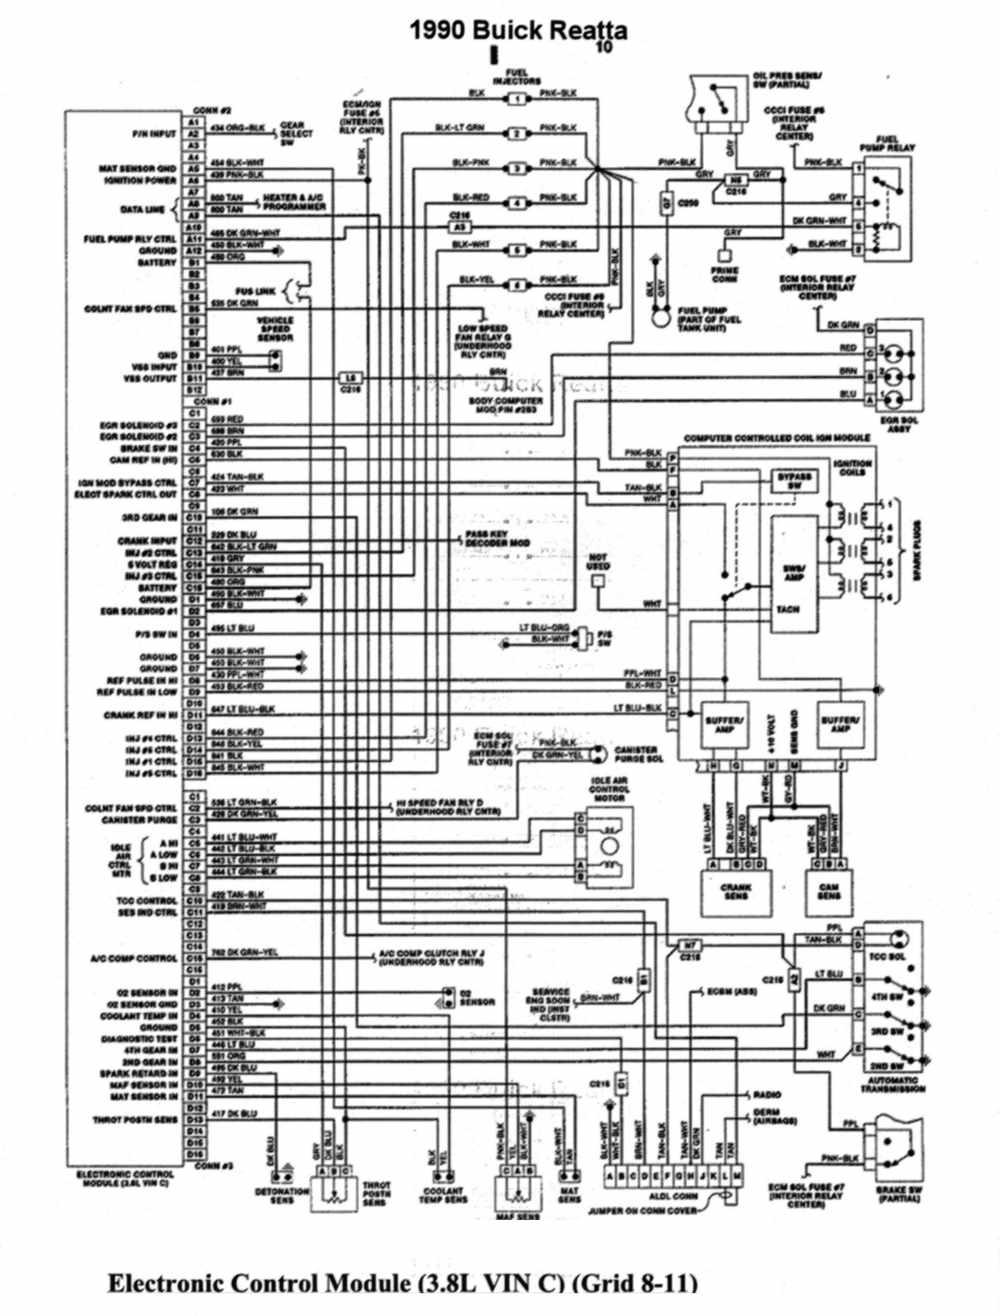 [DIAGRAM_38ZD]  01 Buick Lesabre Ecm Wiring Diagram - Florescent Fixture Wiring Diagram for Wiring  Diagram Schematics | 2001 Buick Lesabre Motor Mount Diagram Wiring Schematic |  | Wiring Diagram Schematics